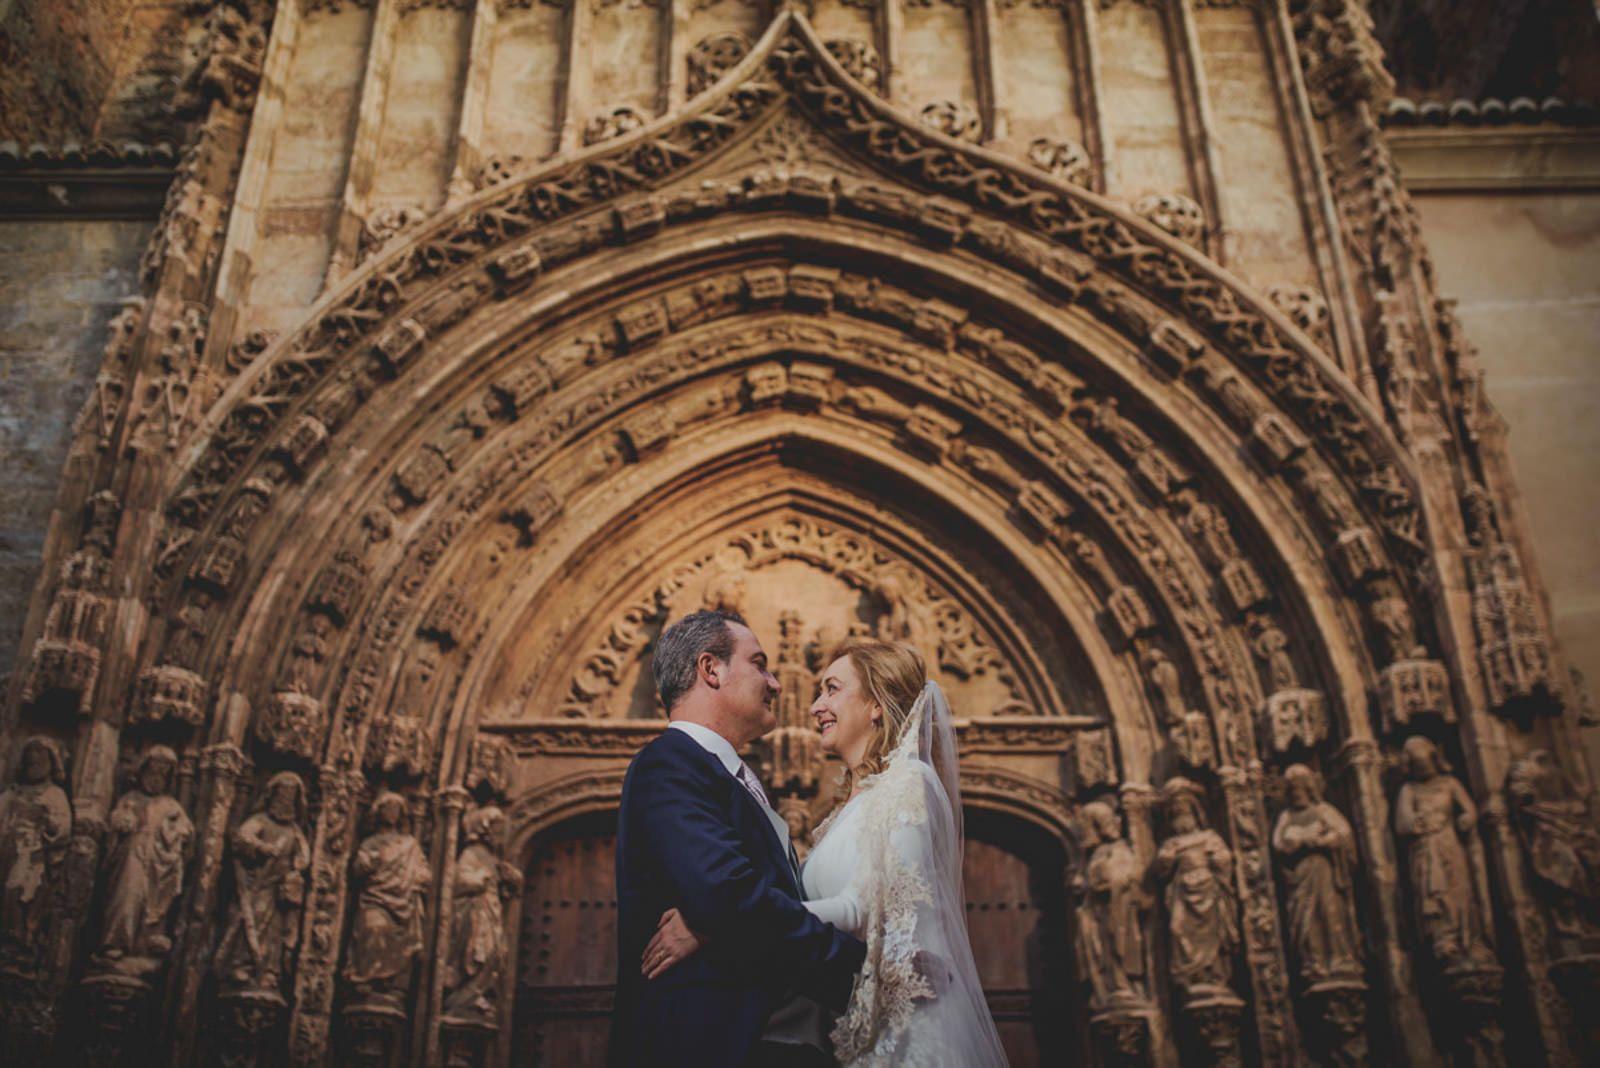 Fotografia de postboda Requena - Santi Miquel - Fotografo de boda - 001